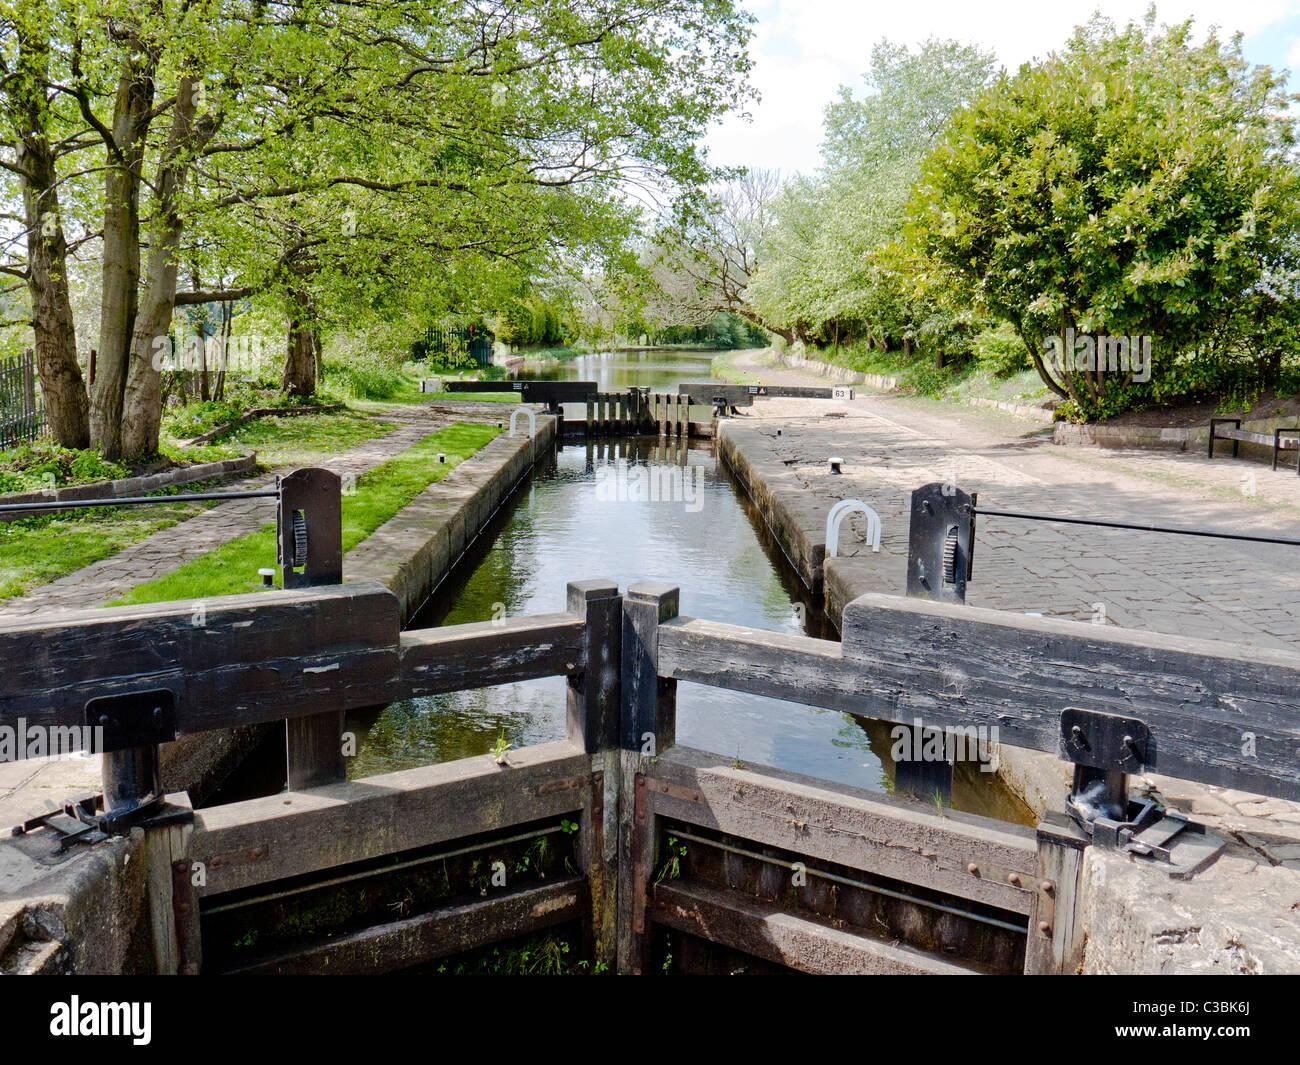 Lock Gates on the Rochdale canal, Chadderton, Oldham, Lancashire, England, UK. - Stock Image